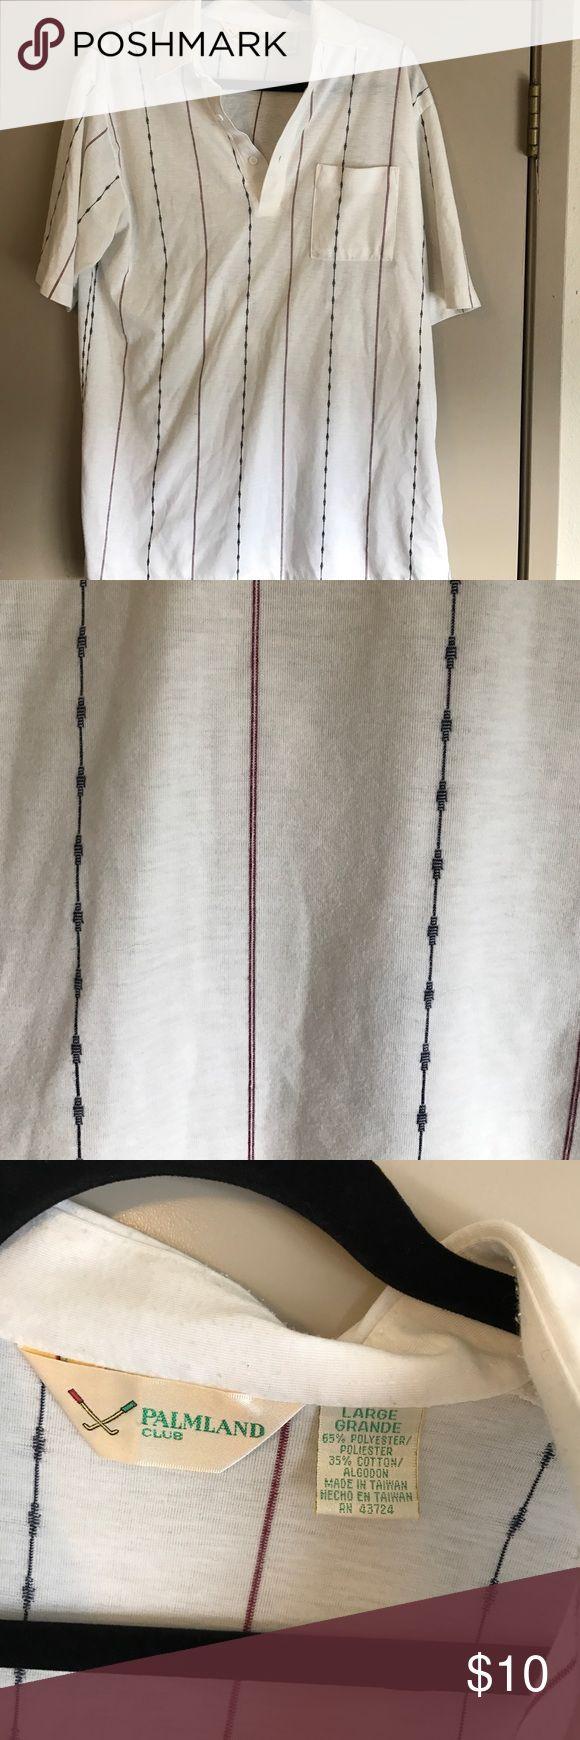 White striped golf shirt White golf shirt with blue and red strips palmland club Shirts Polos